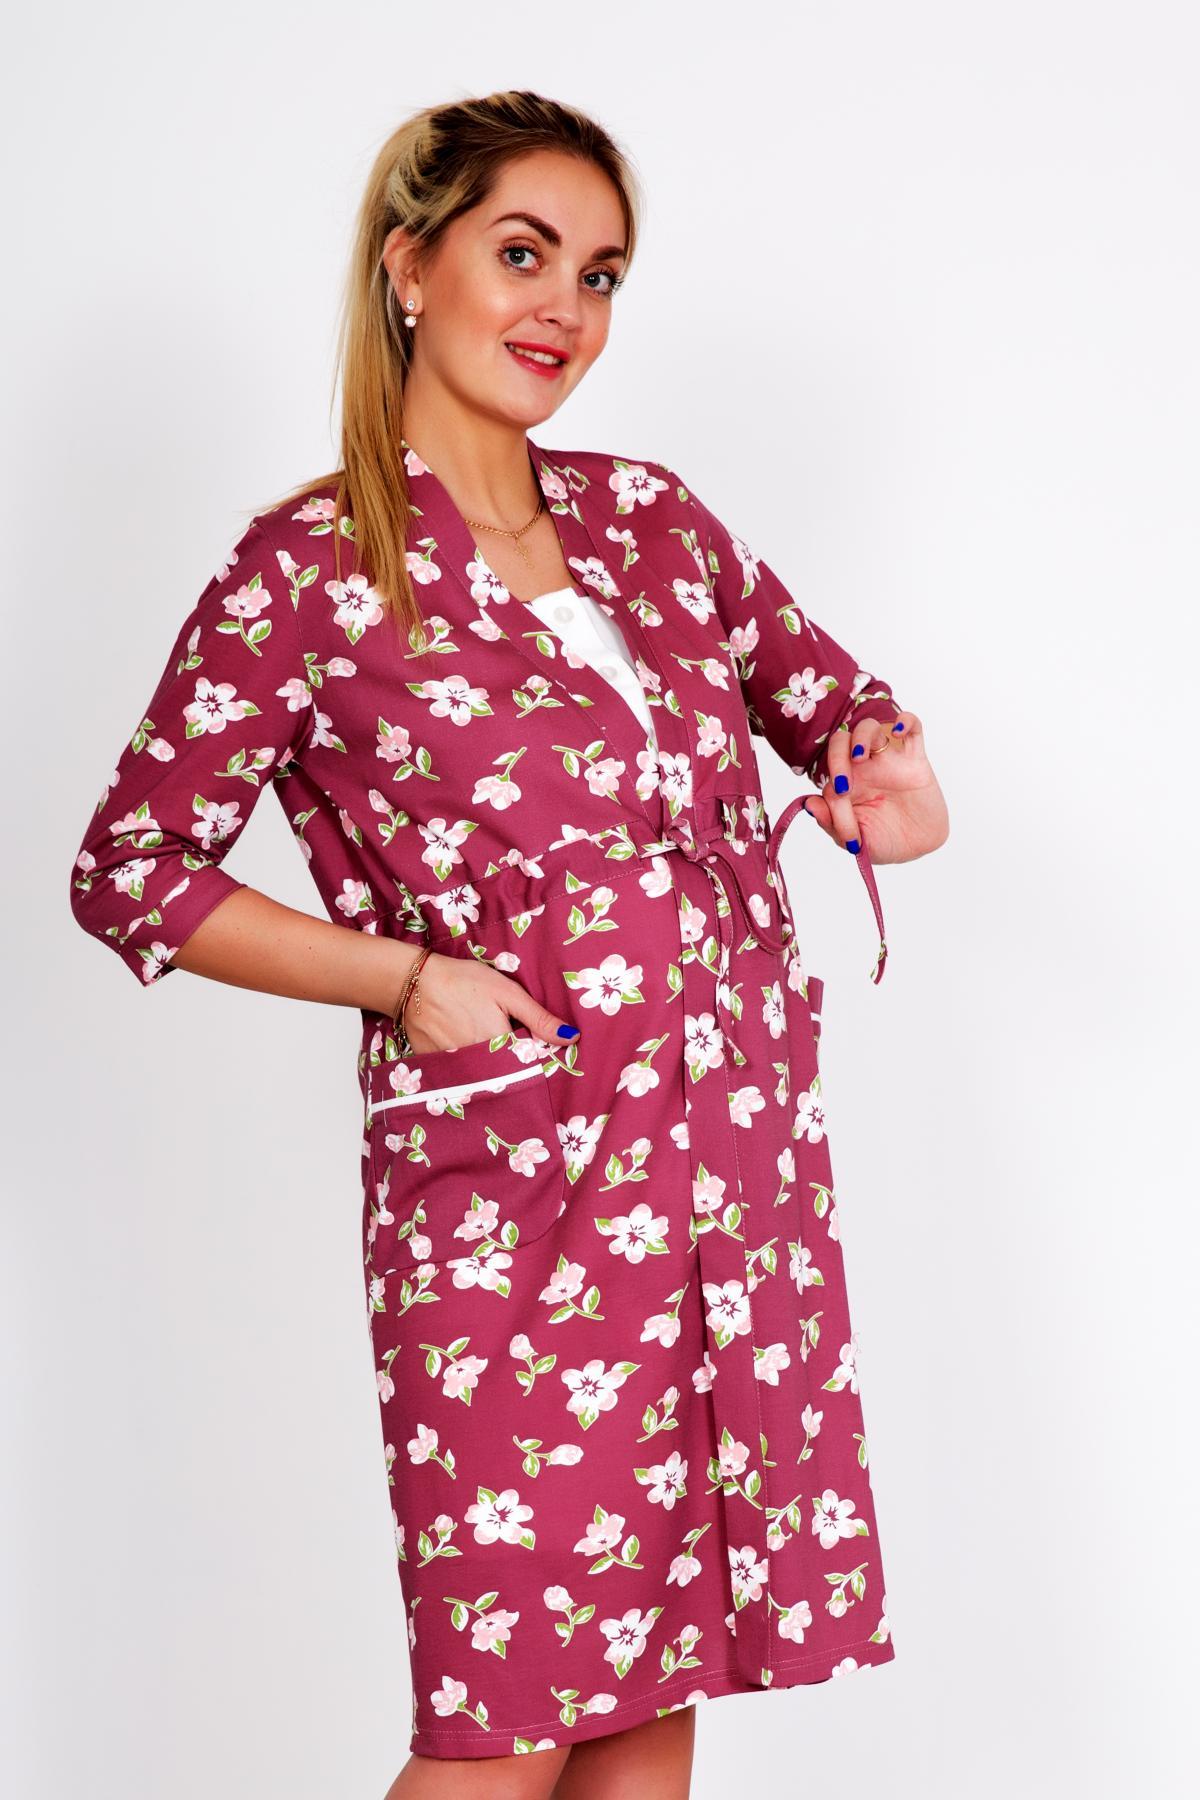 Жен. комплект Mia р. 52Ночные сорочки<br><br><br>Тип: Жен. комплект<br>Размер: 52<br>Материал: Кулирка